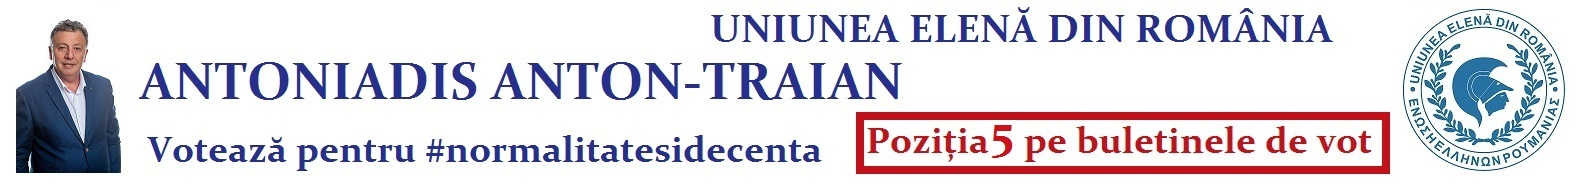 anton-traian-antoniadis-candidat-uniunea-elena-din-romania-primaria-constanta